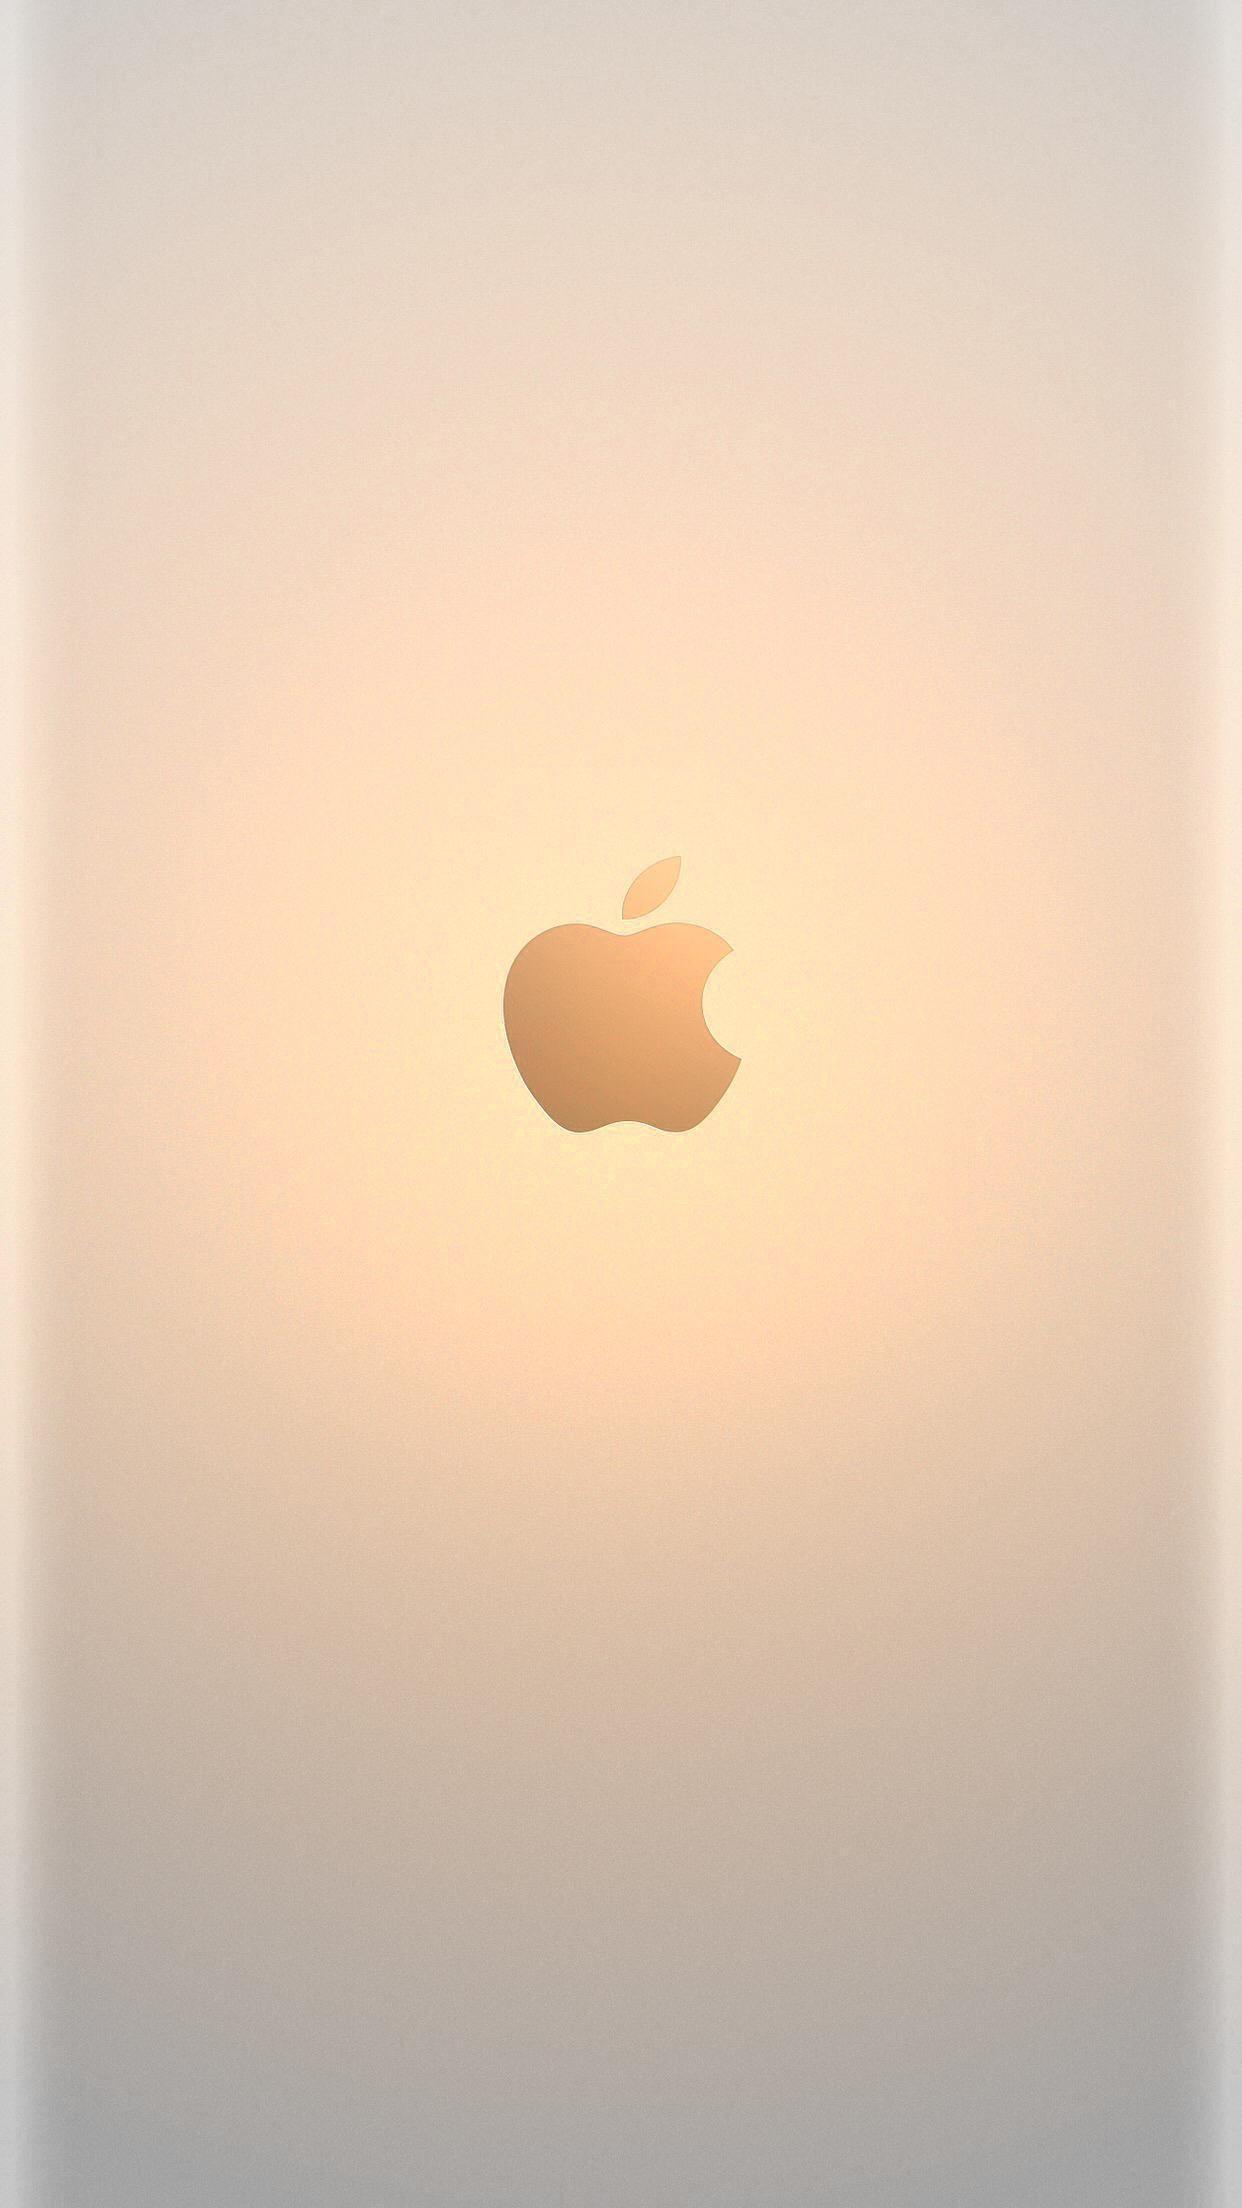 Iphone 7 Plus Wallpaper Apple Plus Back Rose Gold Pronounced Iphone 7 Rose Gold Apple 1242x2208 Download Hd Wallpaper Wallpapertip